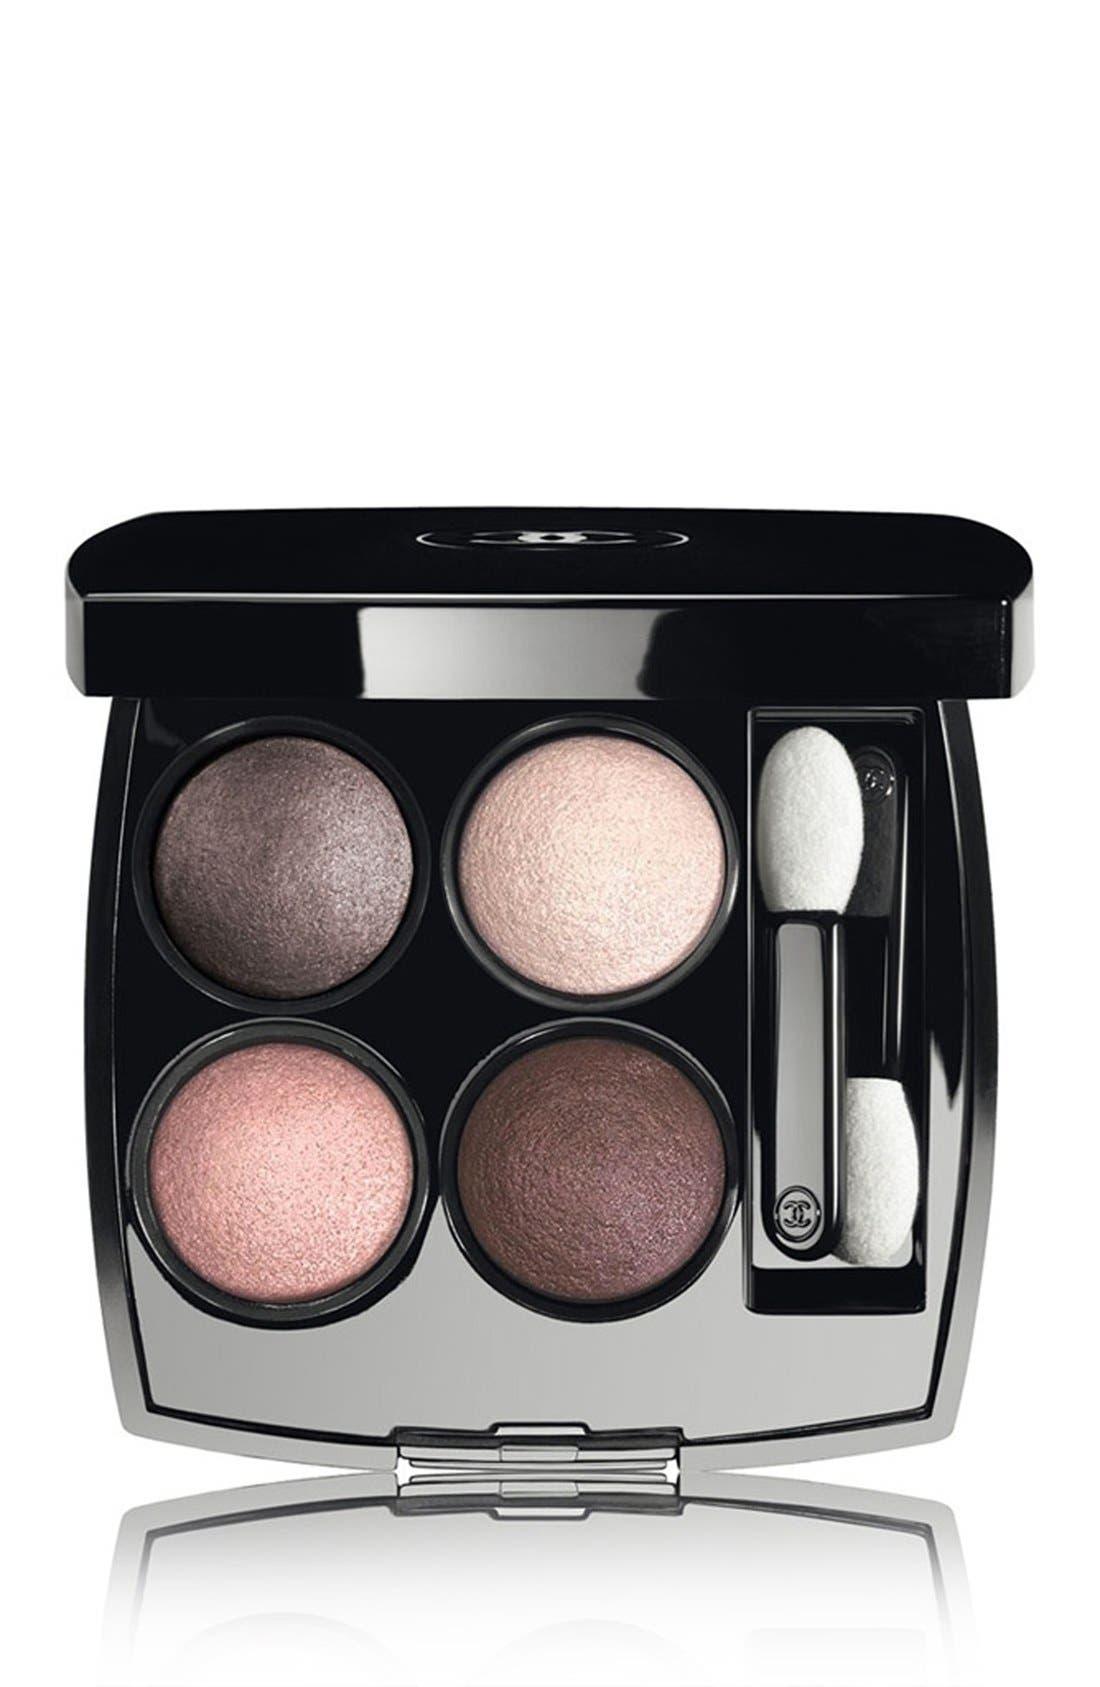 ,                             LES 4 OMBRES<br />Multi-Effect Quadra Eyeshadow,                             Main thumbnail 1, color,                             202 TISSE CAMELIA